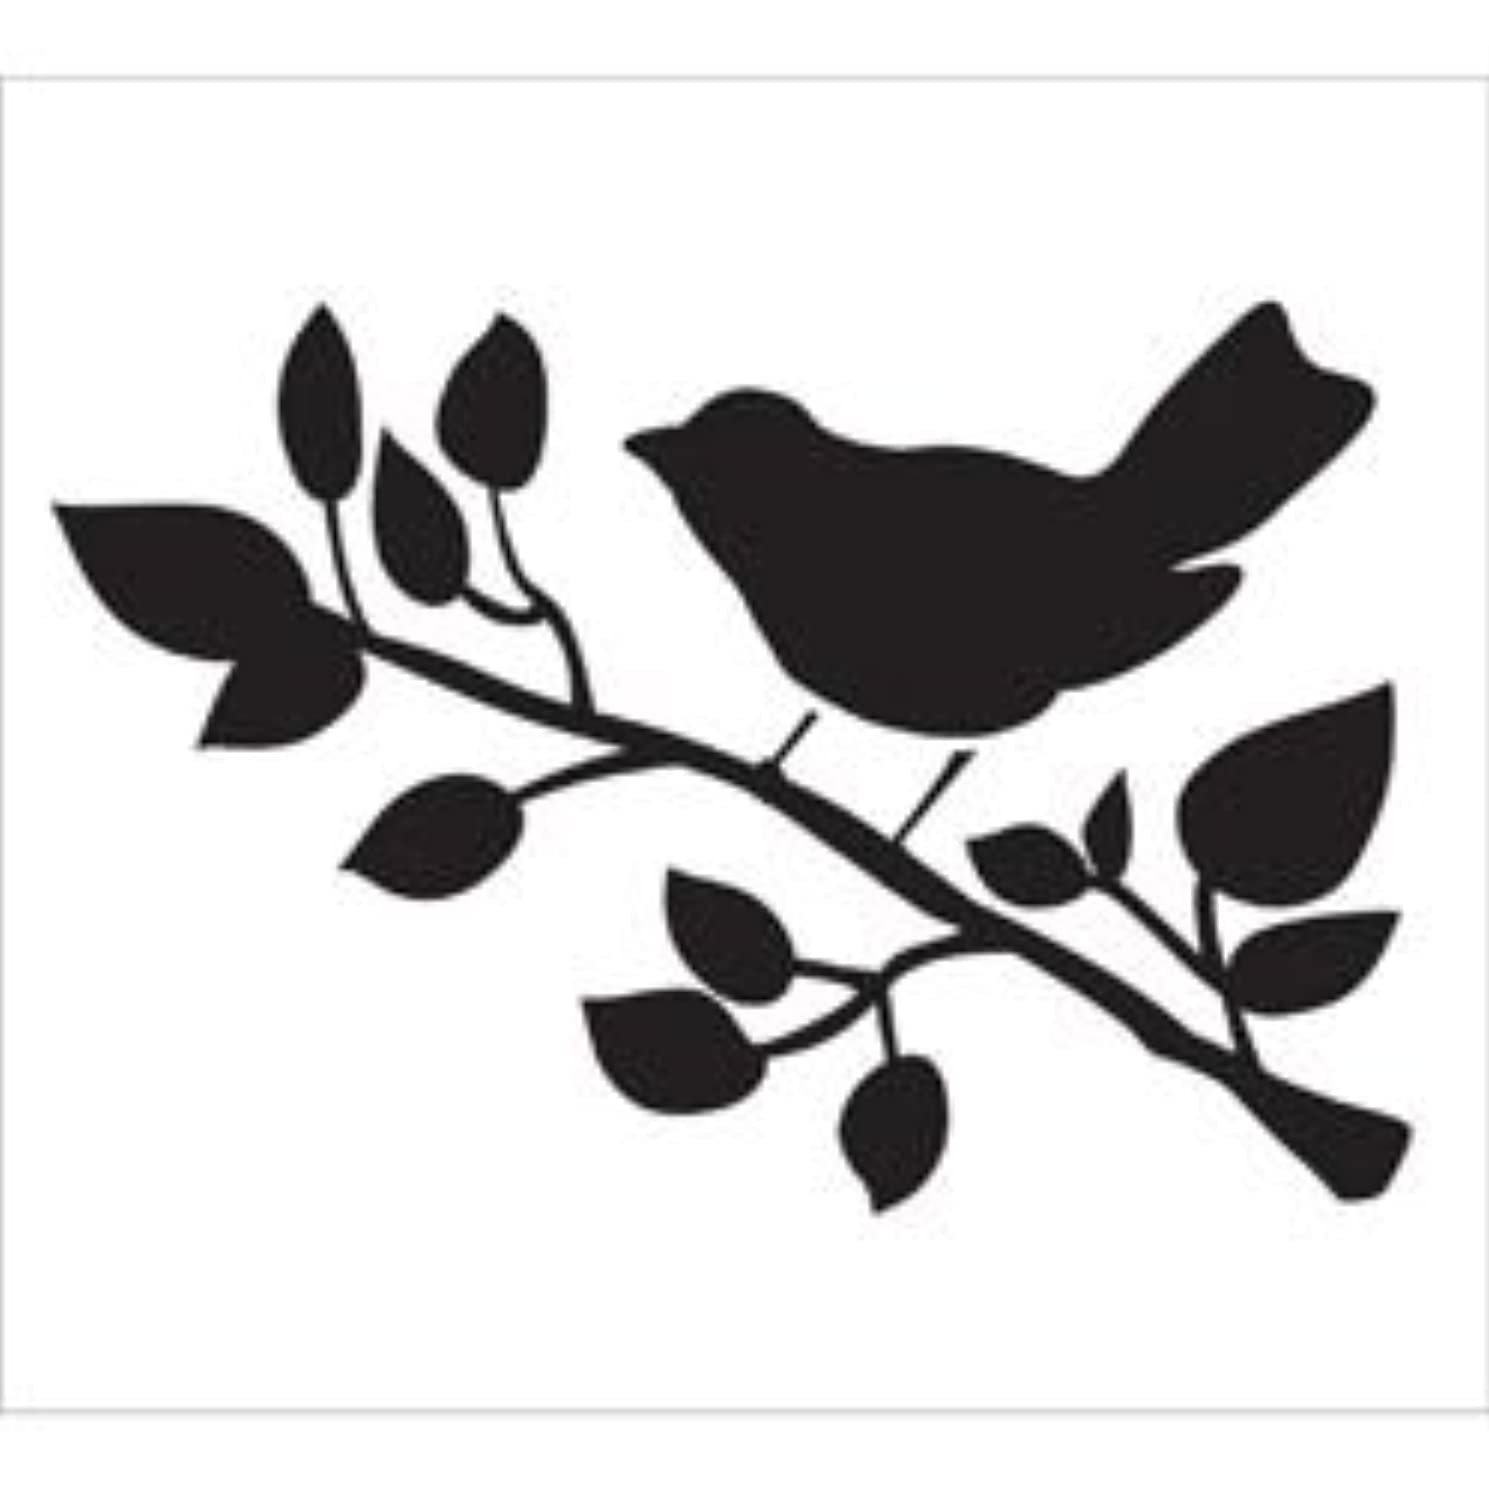 Bulk Buy: Martha Stewart Crafts (3-Pack) FolkArt Painting Stencil 8.5in. x 10in. Bird FAPS-30601